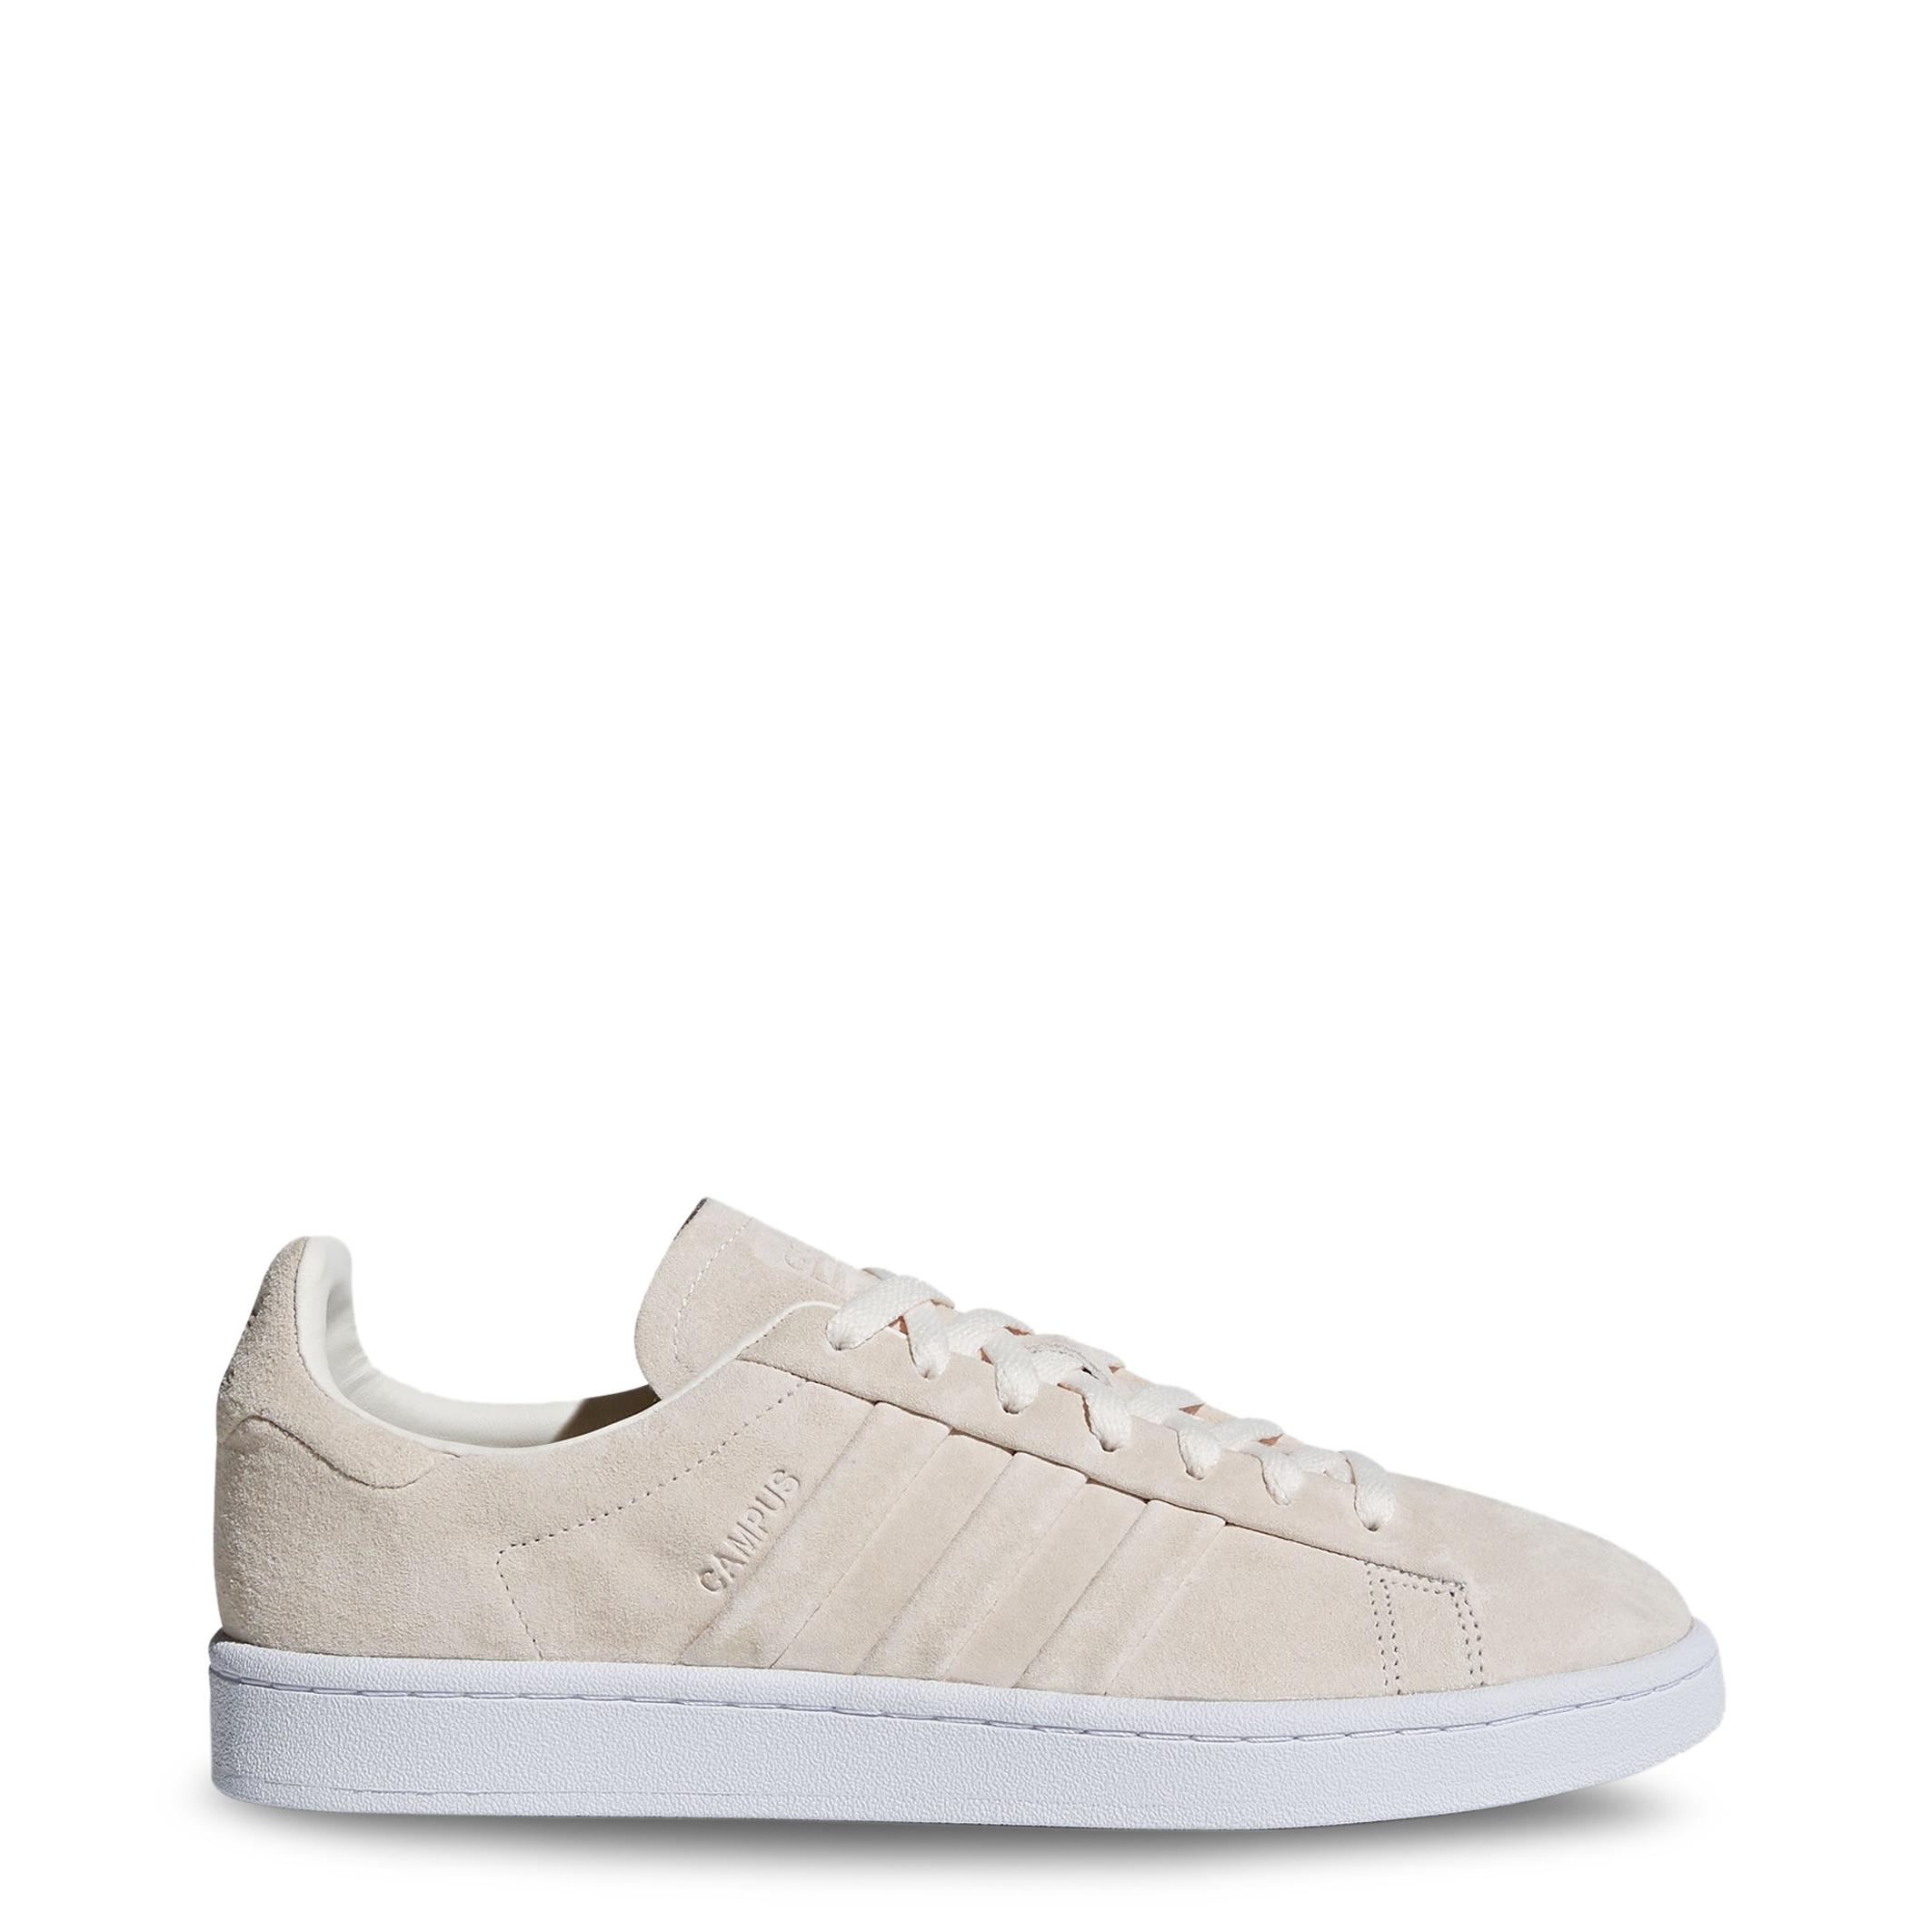 Adidas CAMPUS Donna Bianco 97936